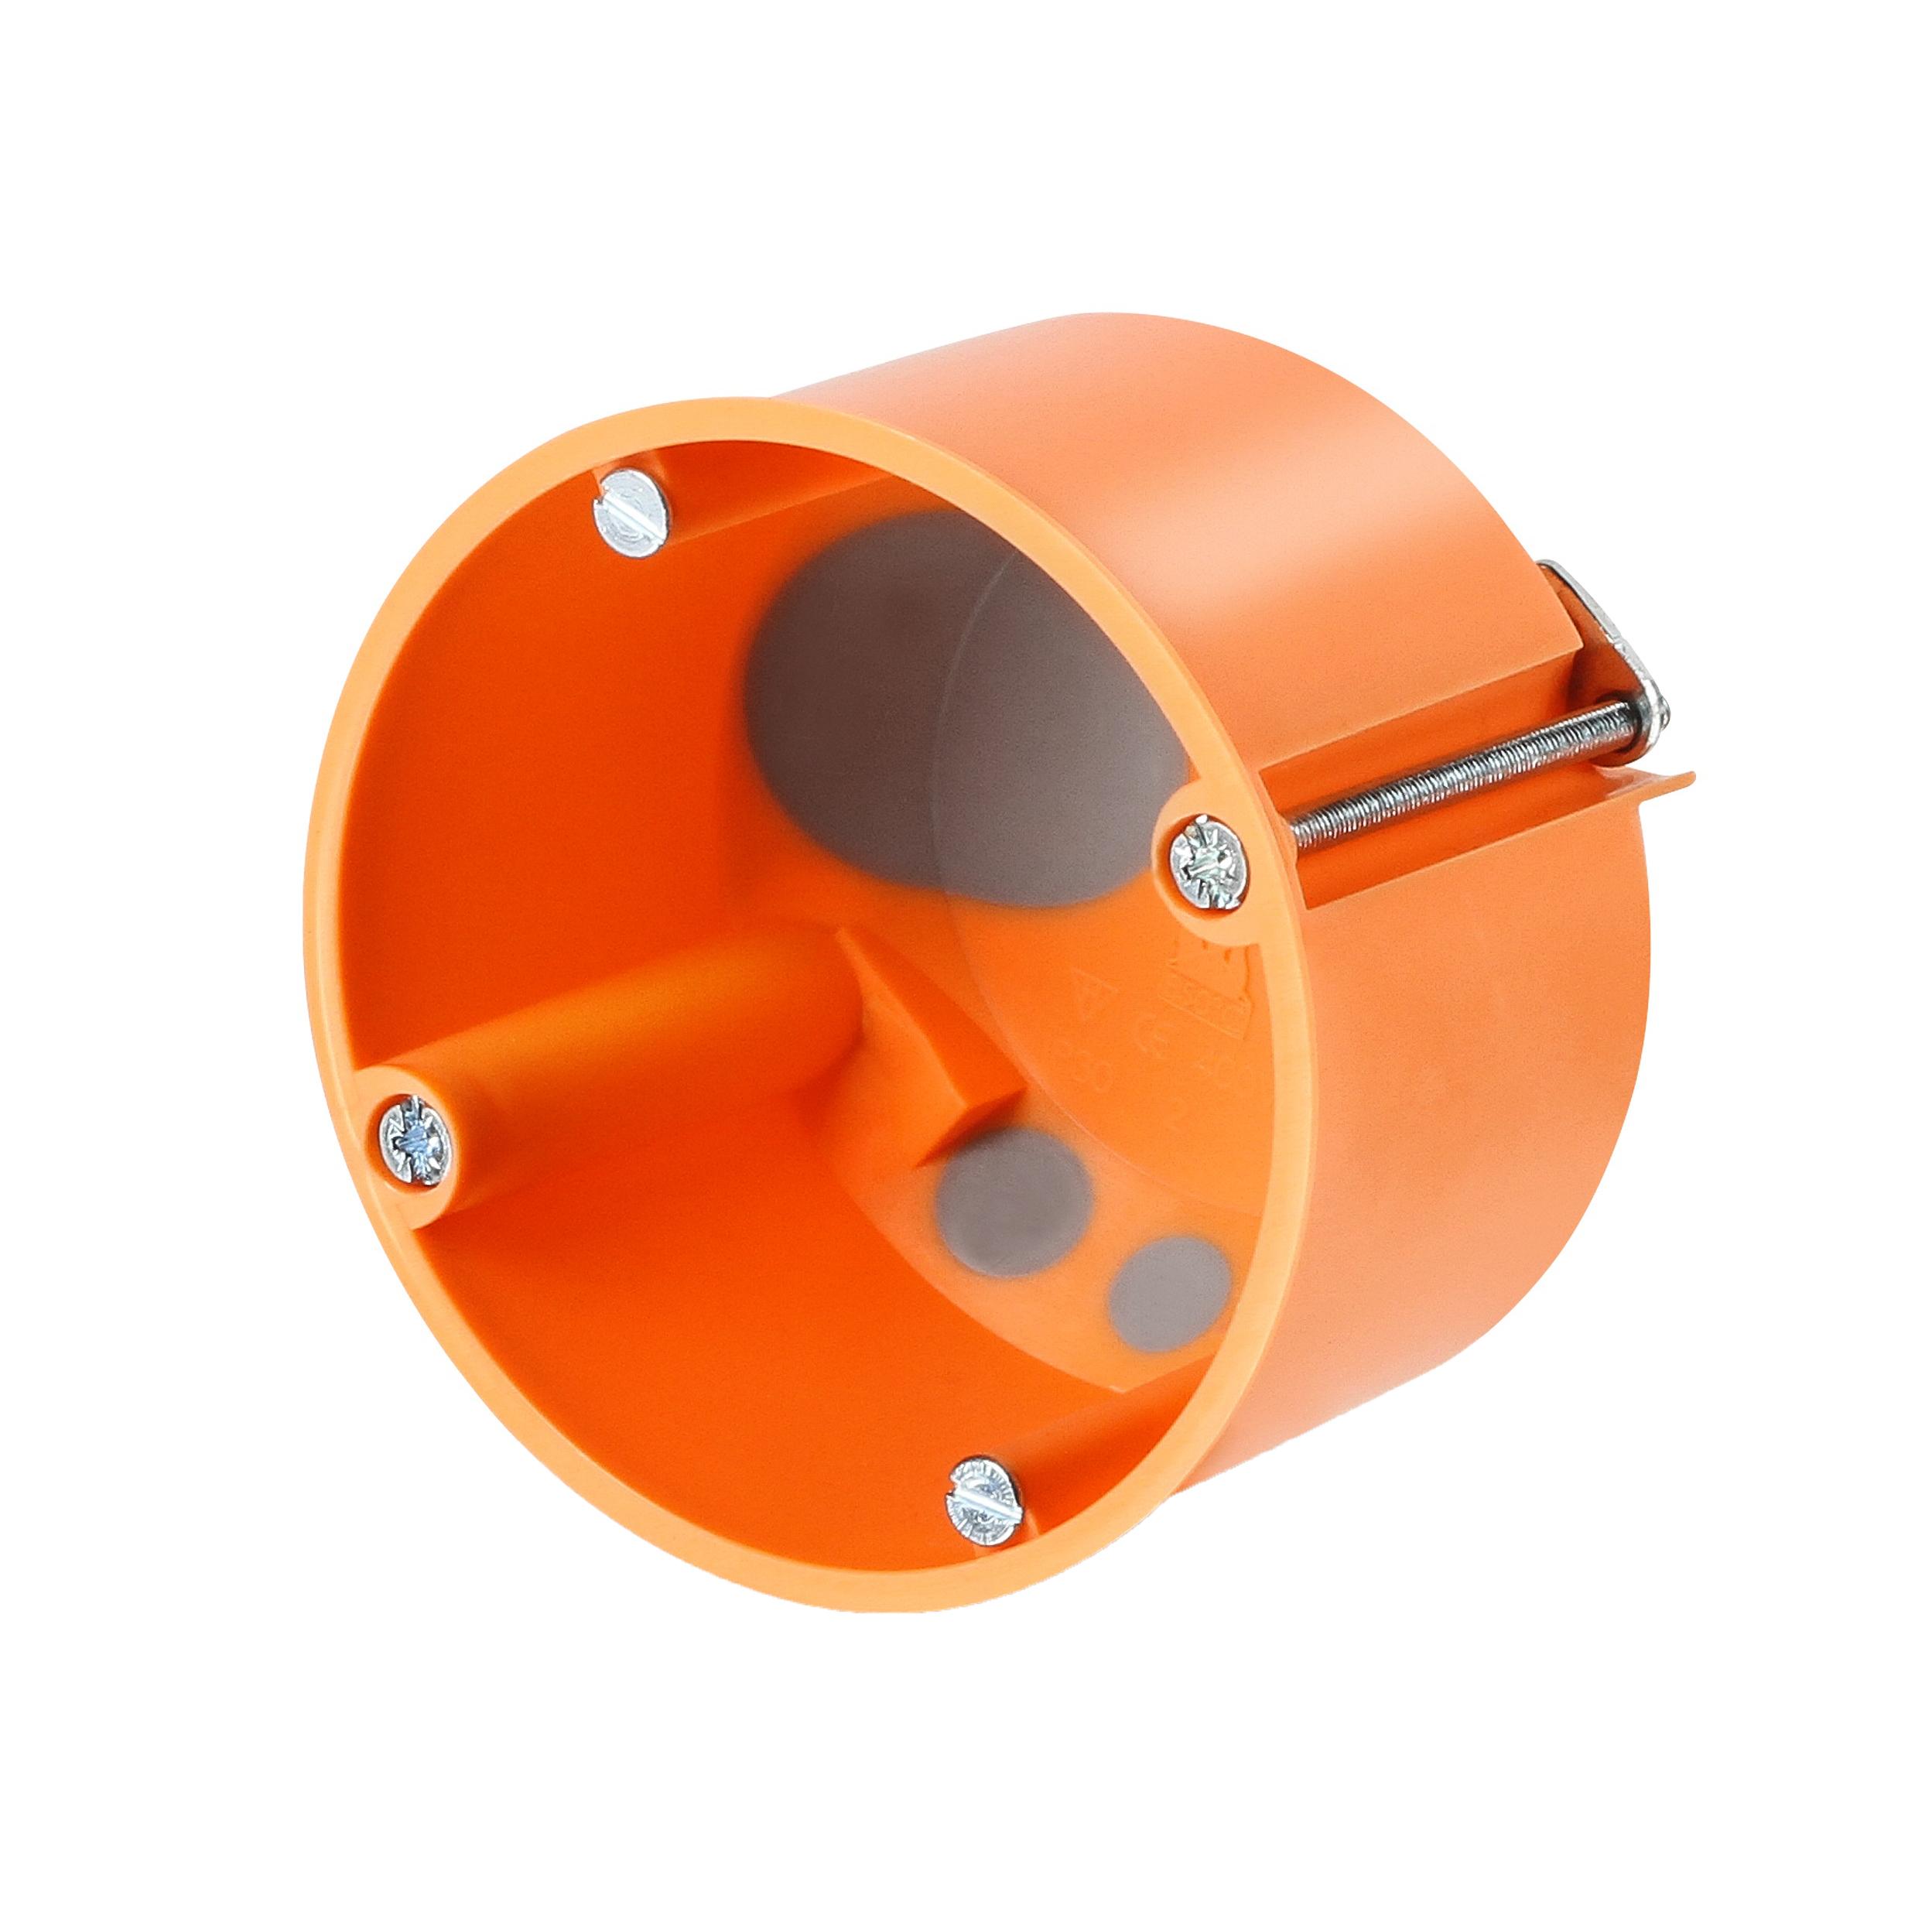 100 Stk Hohlwandschalterdose winddicht d68/t47mm, orange, M20, PP GTDW2000--